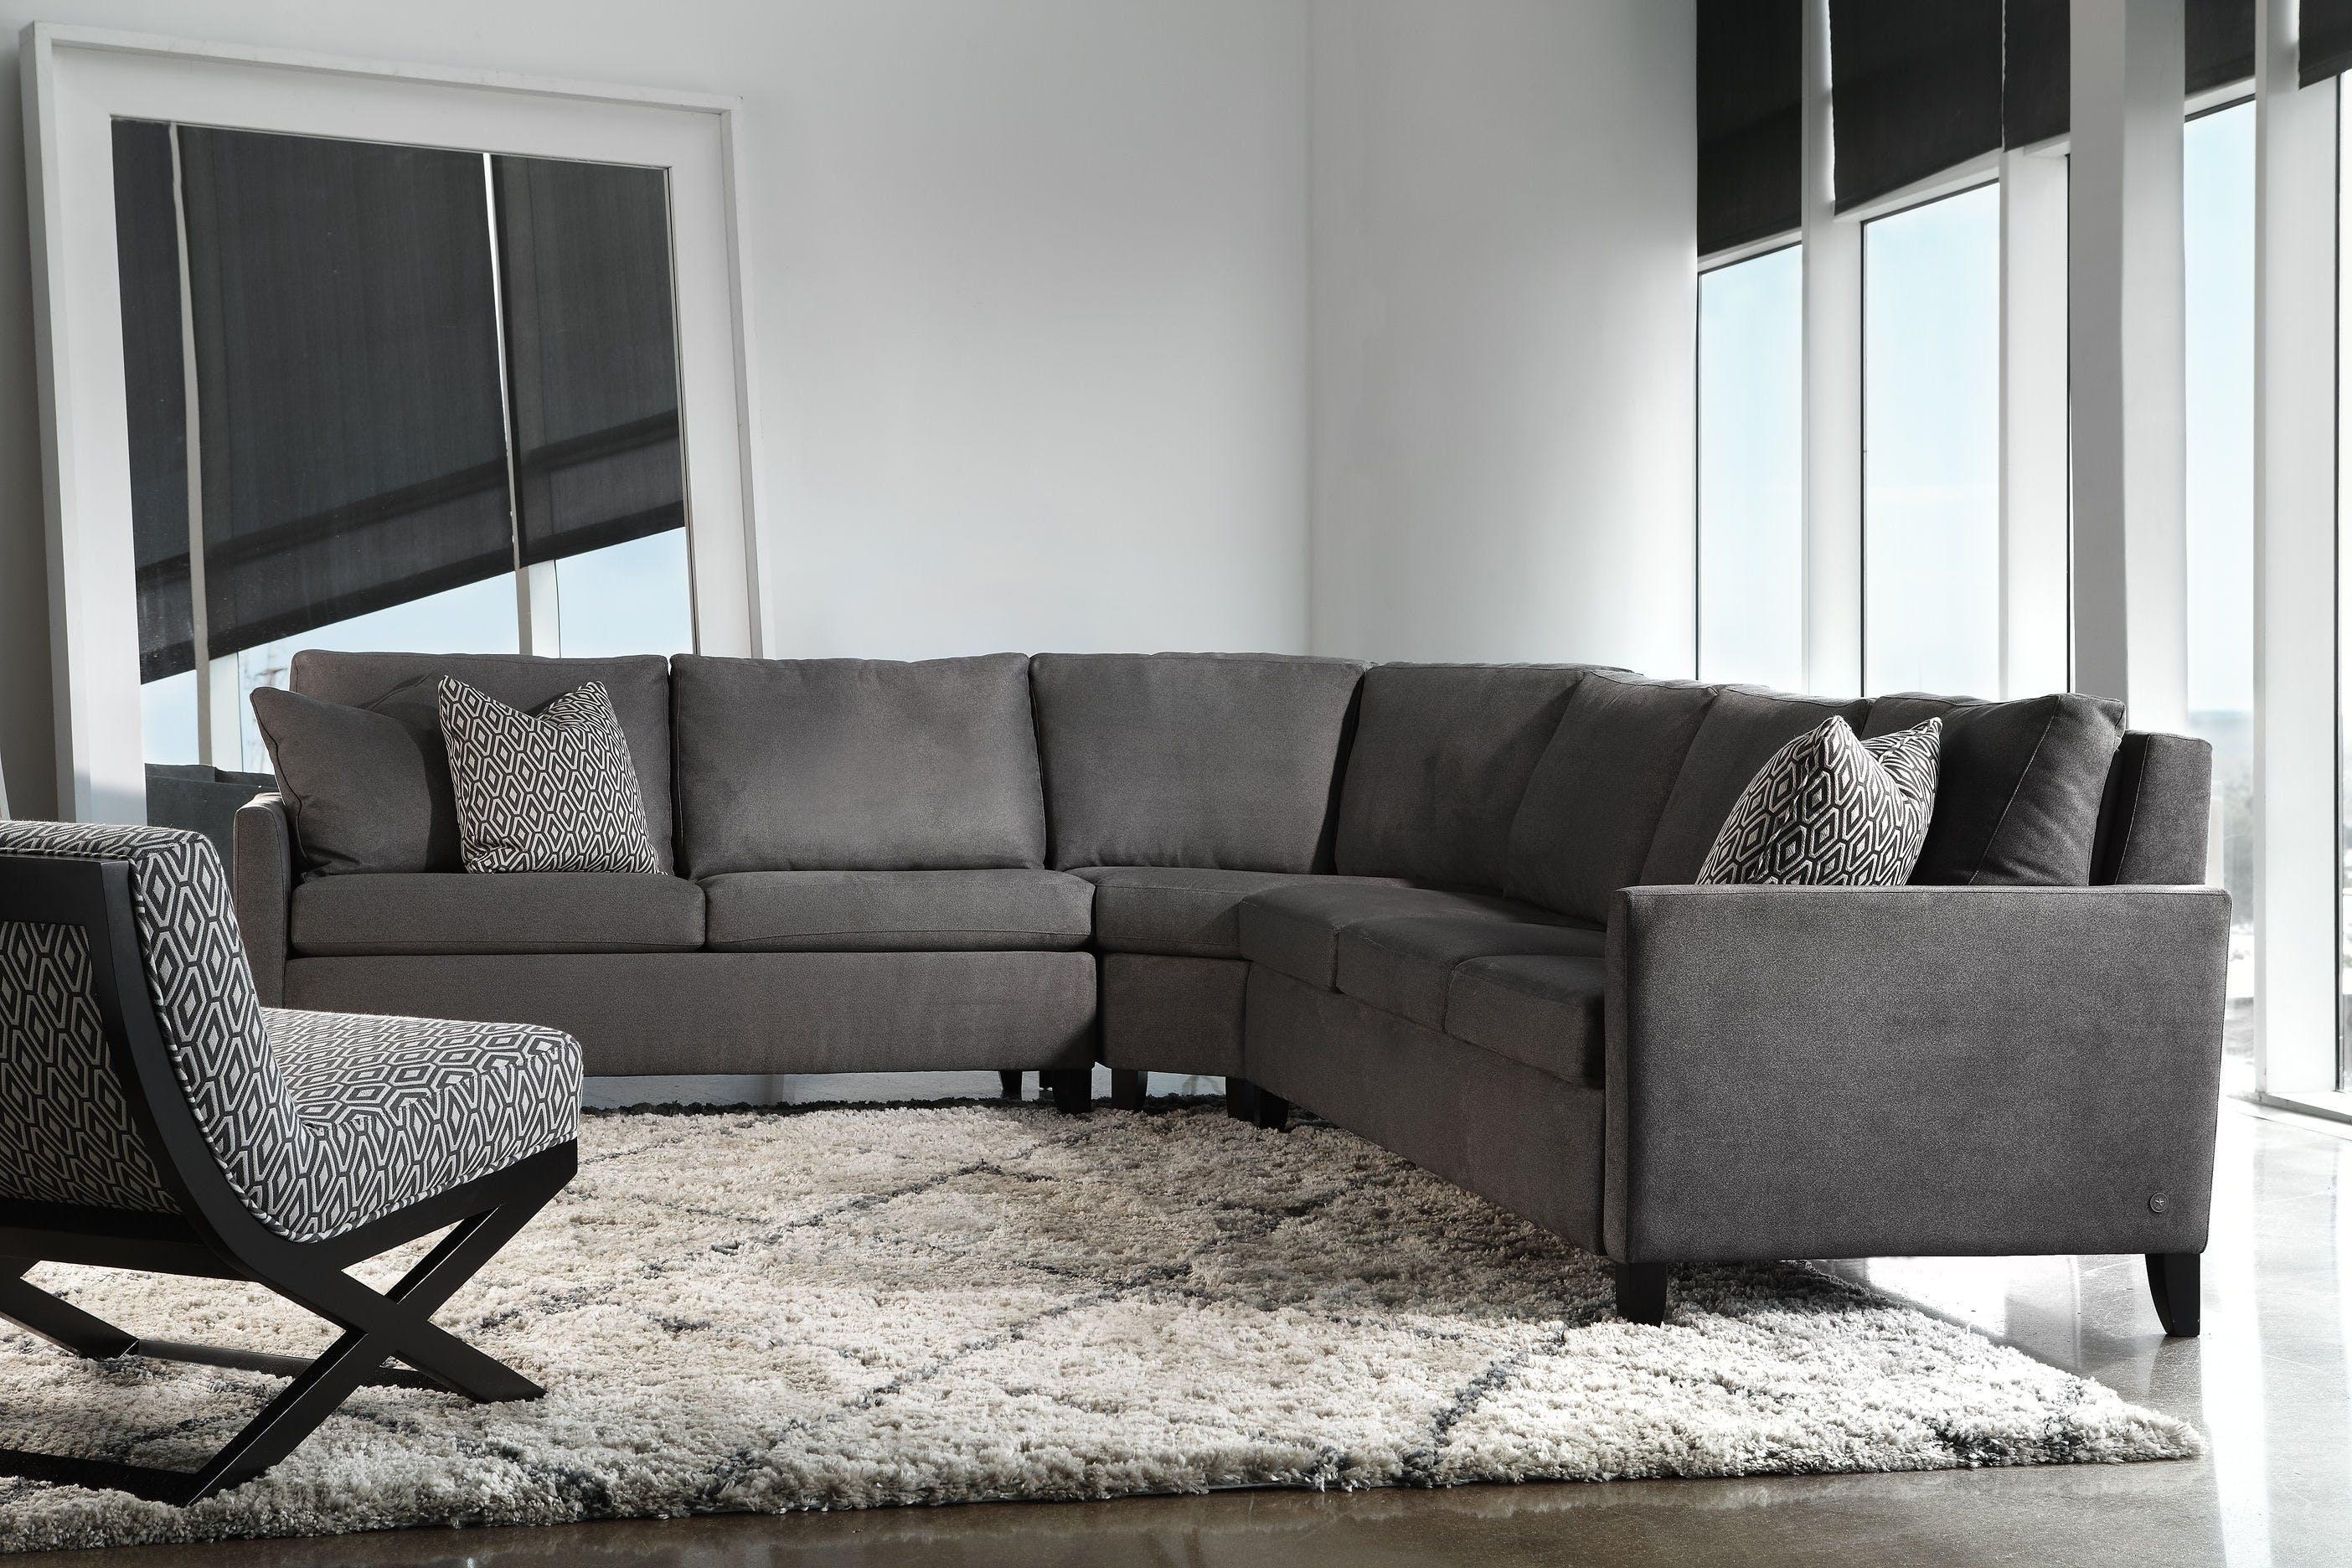 Furniture: Costco Sectionals | Berkline Sectional Costco | Macys With Regard To Berkline Sofas (Image 7 of 20)